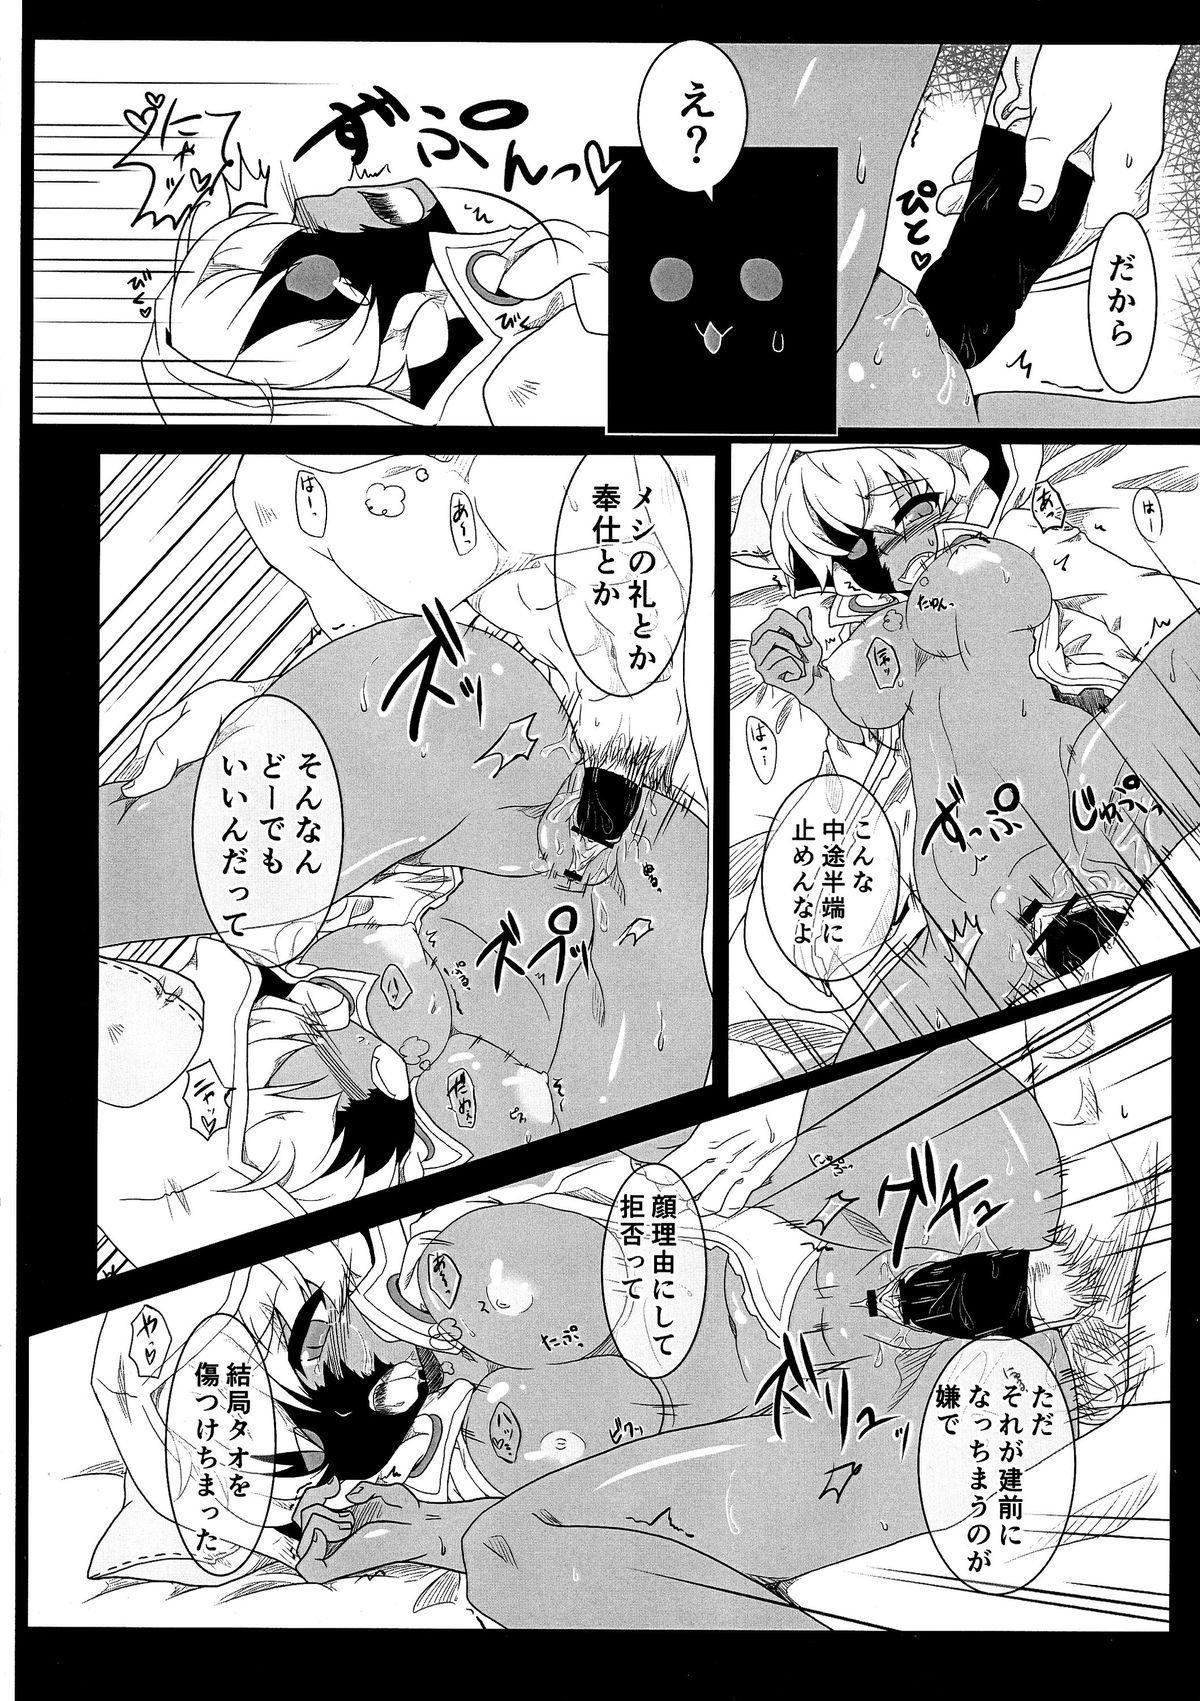 Tao no Ongaeshi 35